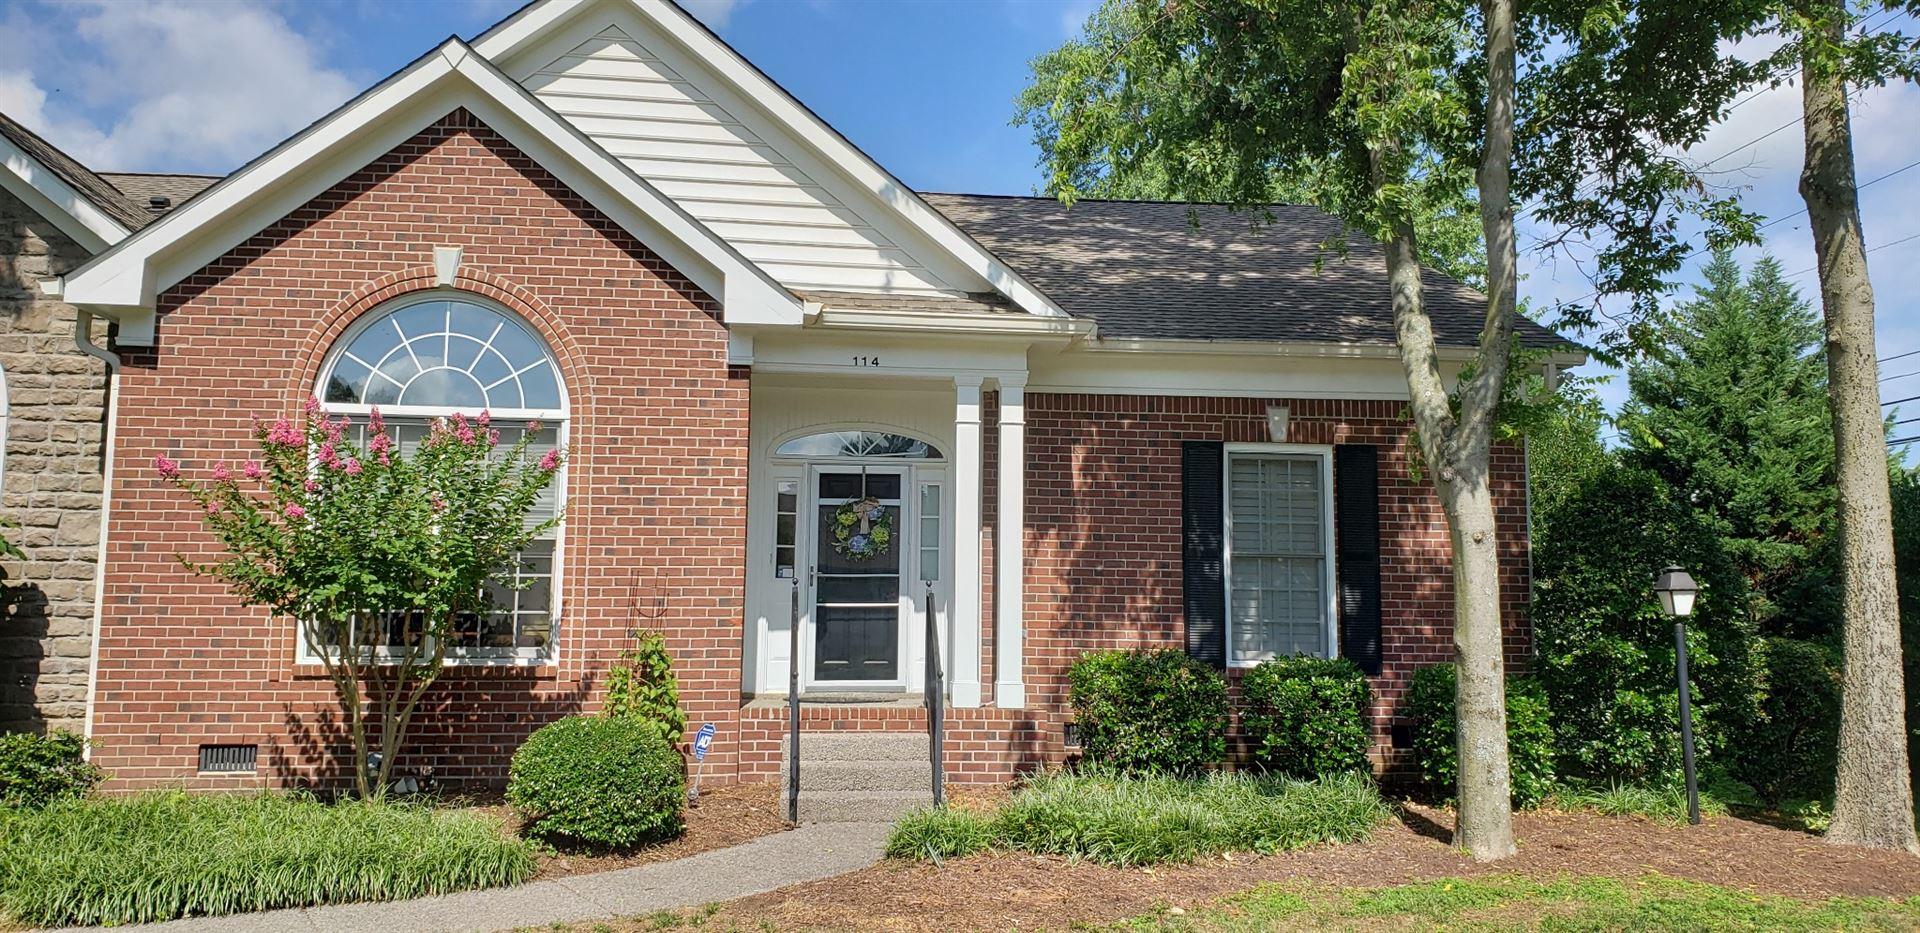 5601 Cloverland Dr, Brentwood, TN 37027 - MLS#: 2276170